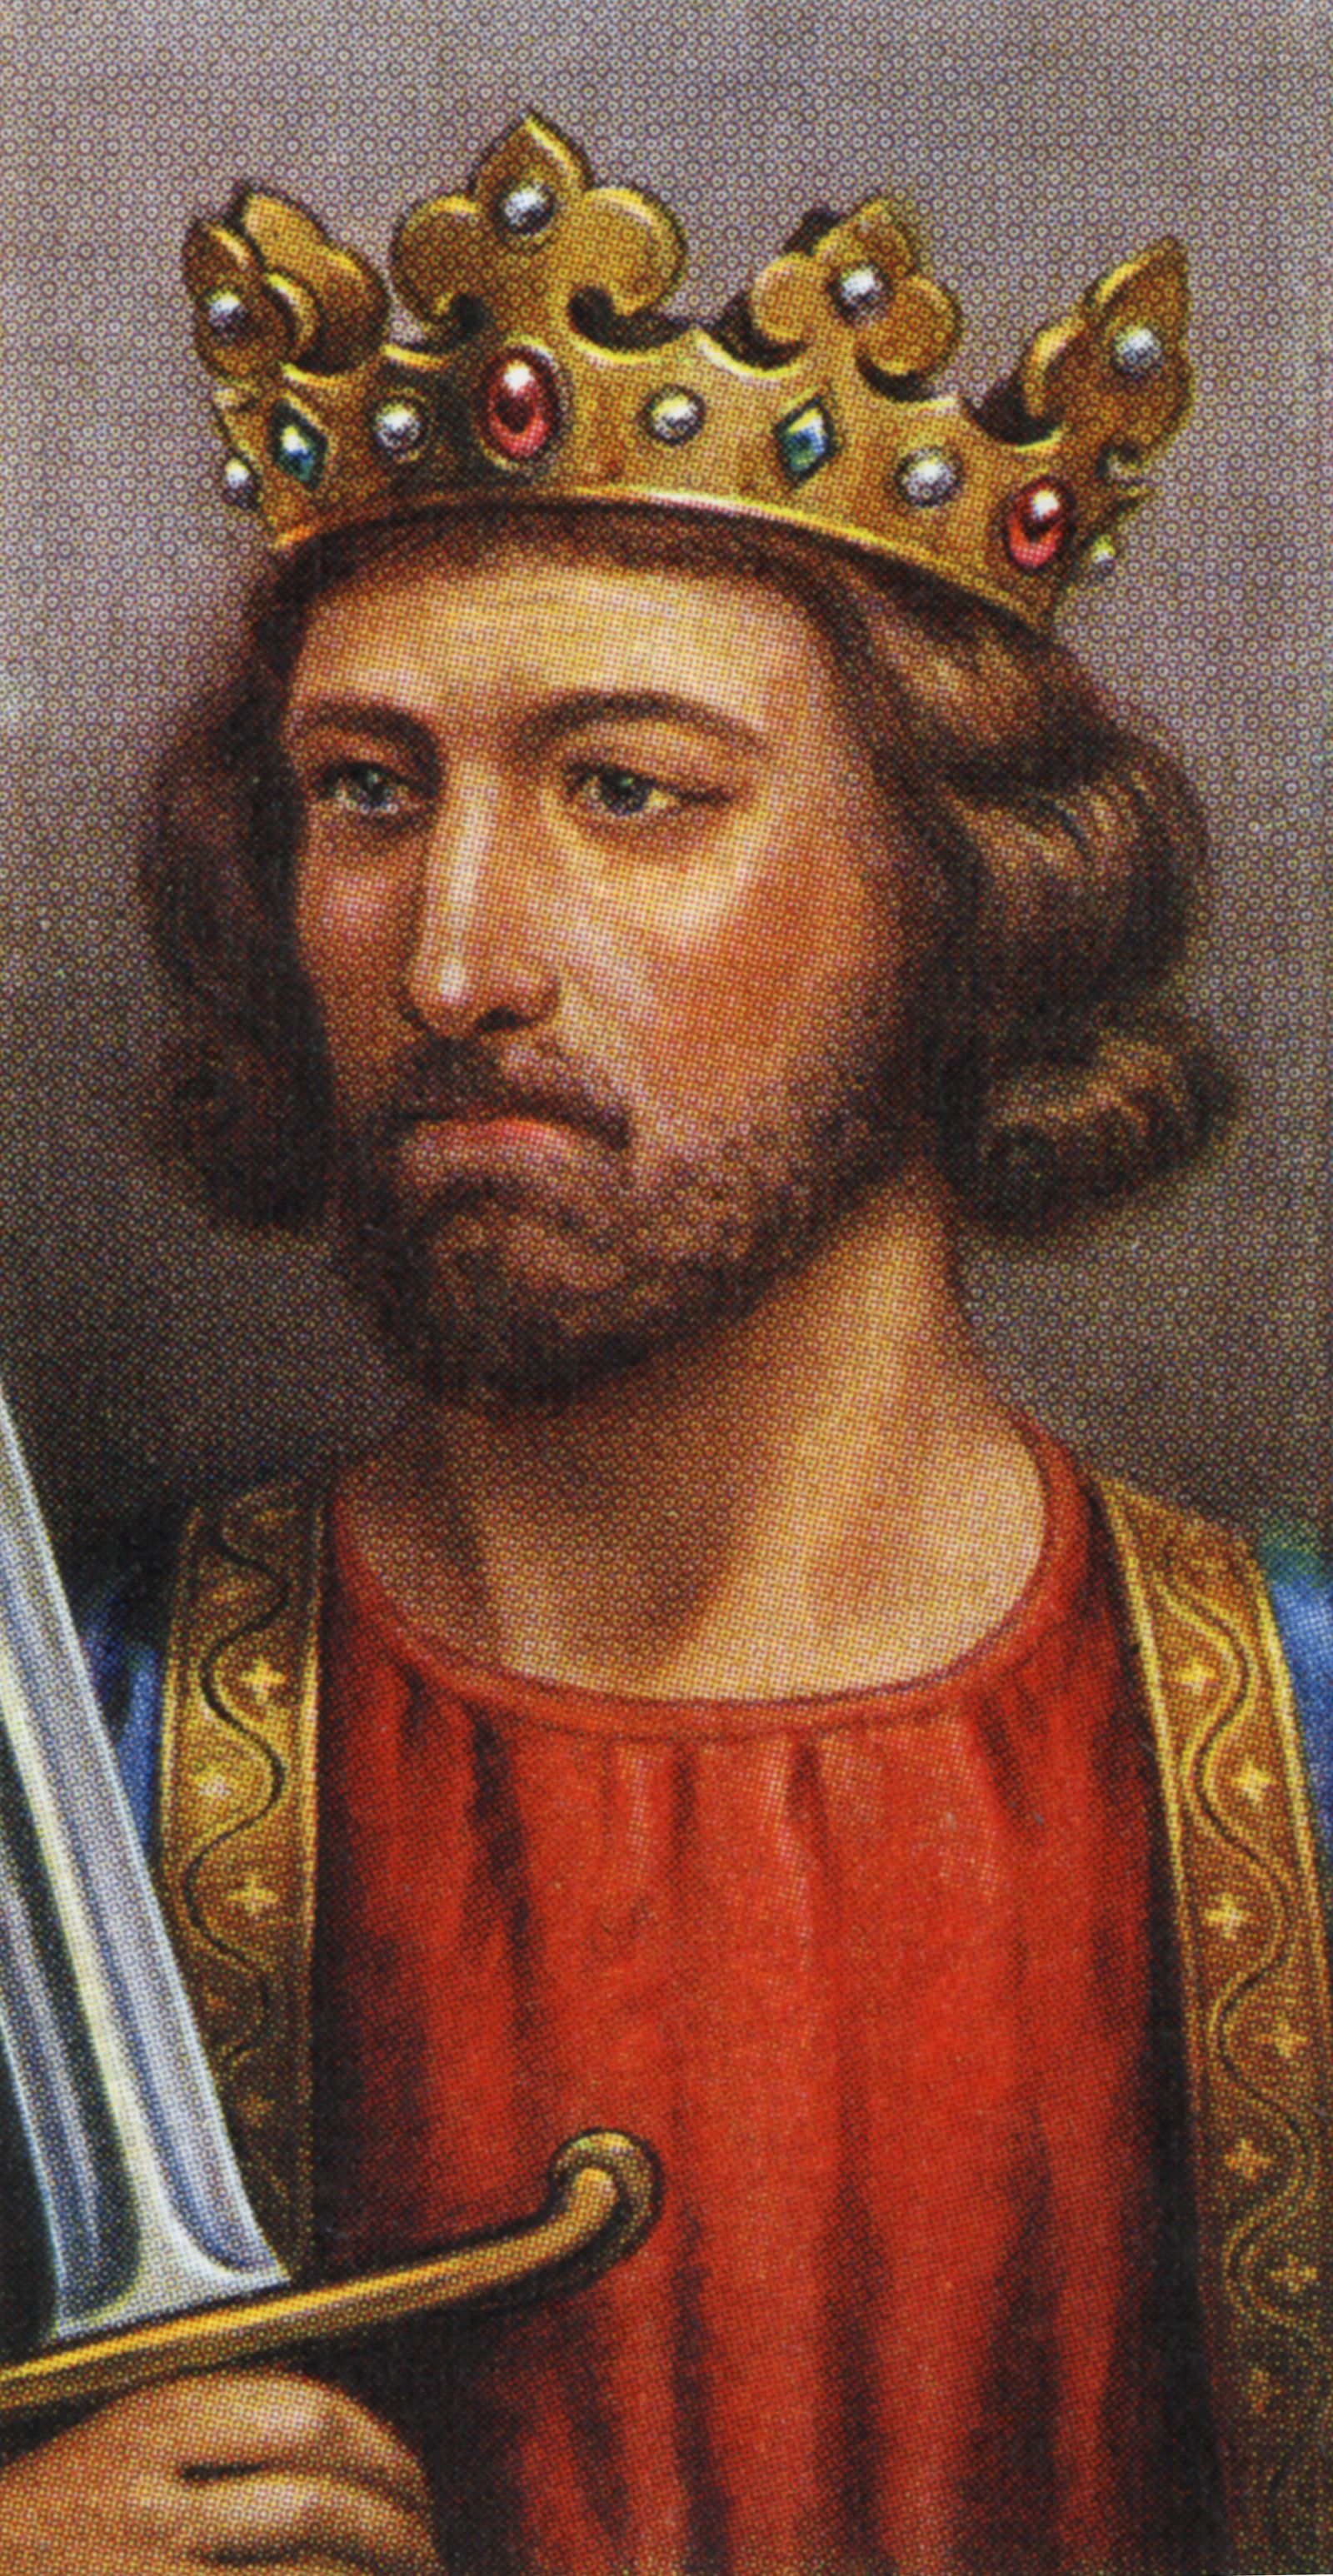 King Edward I portrait (reigned 1272 -